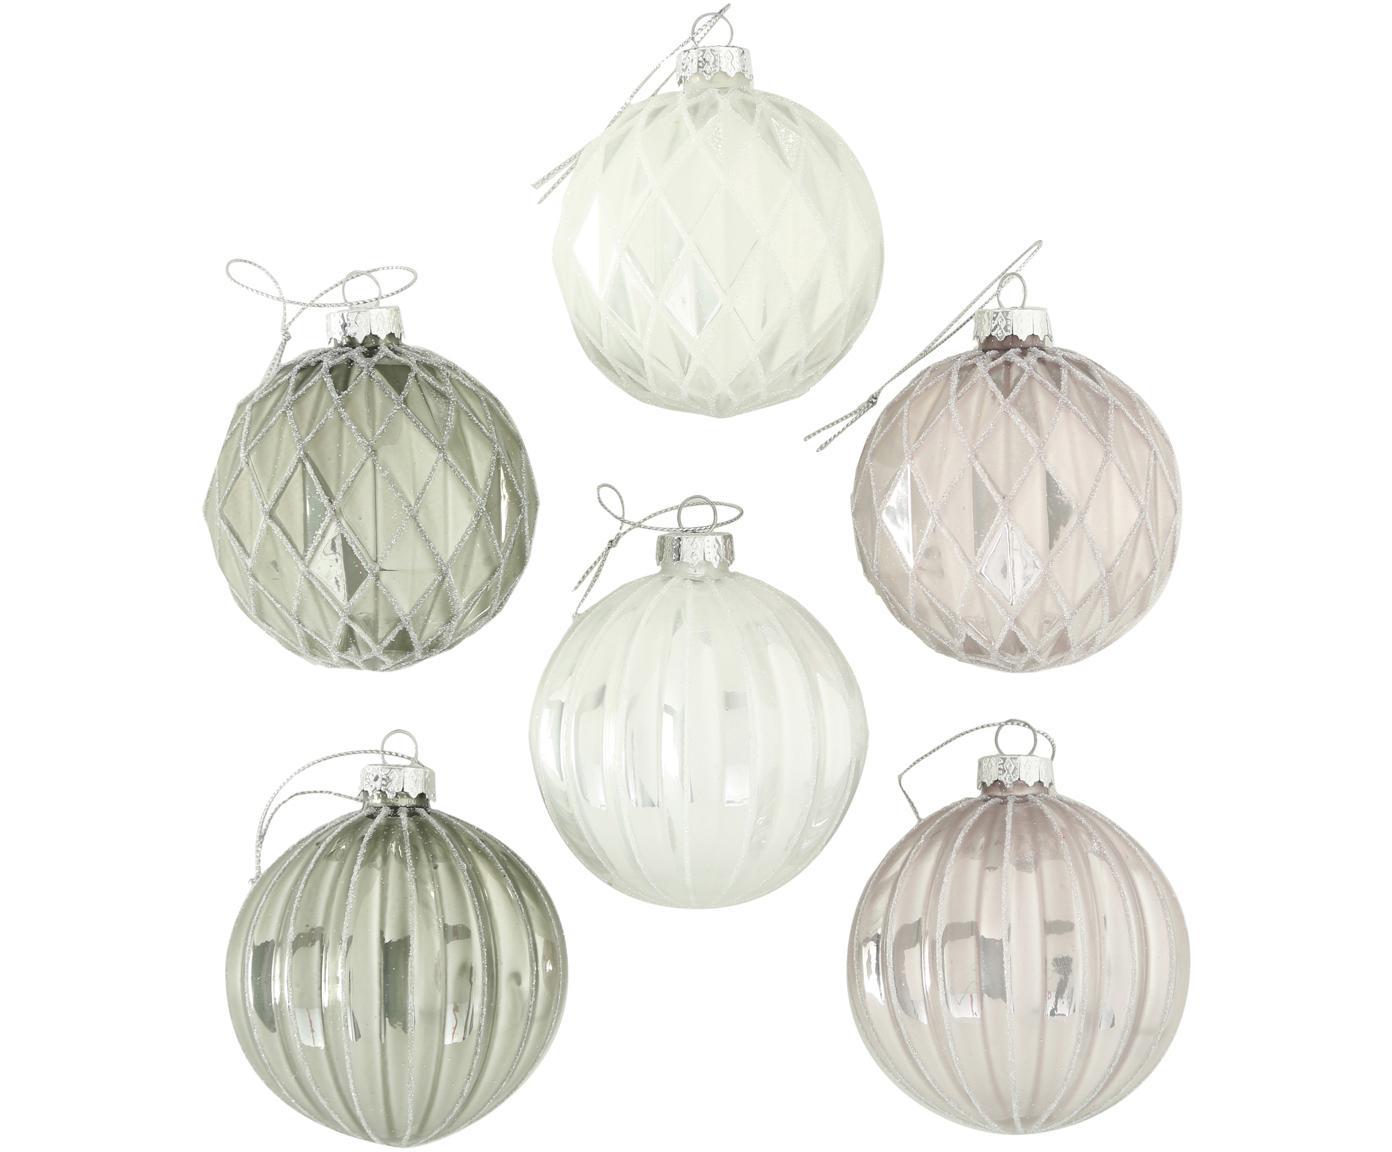 Kerstballenset Kubus, 6-delig, Wit, lichtroze, lichtgroen, Ø 8 x H 8 cm